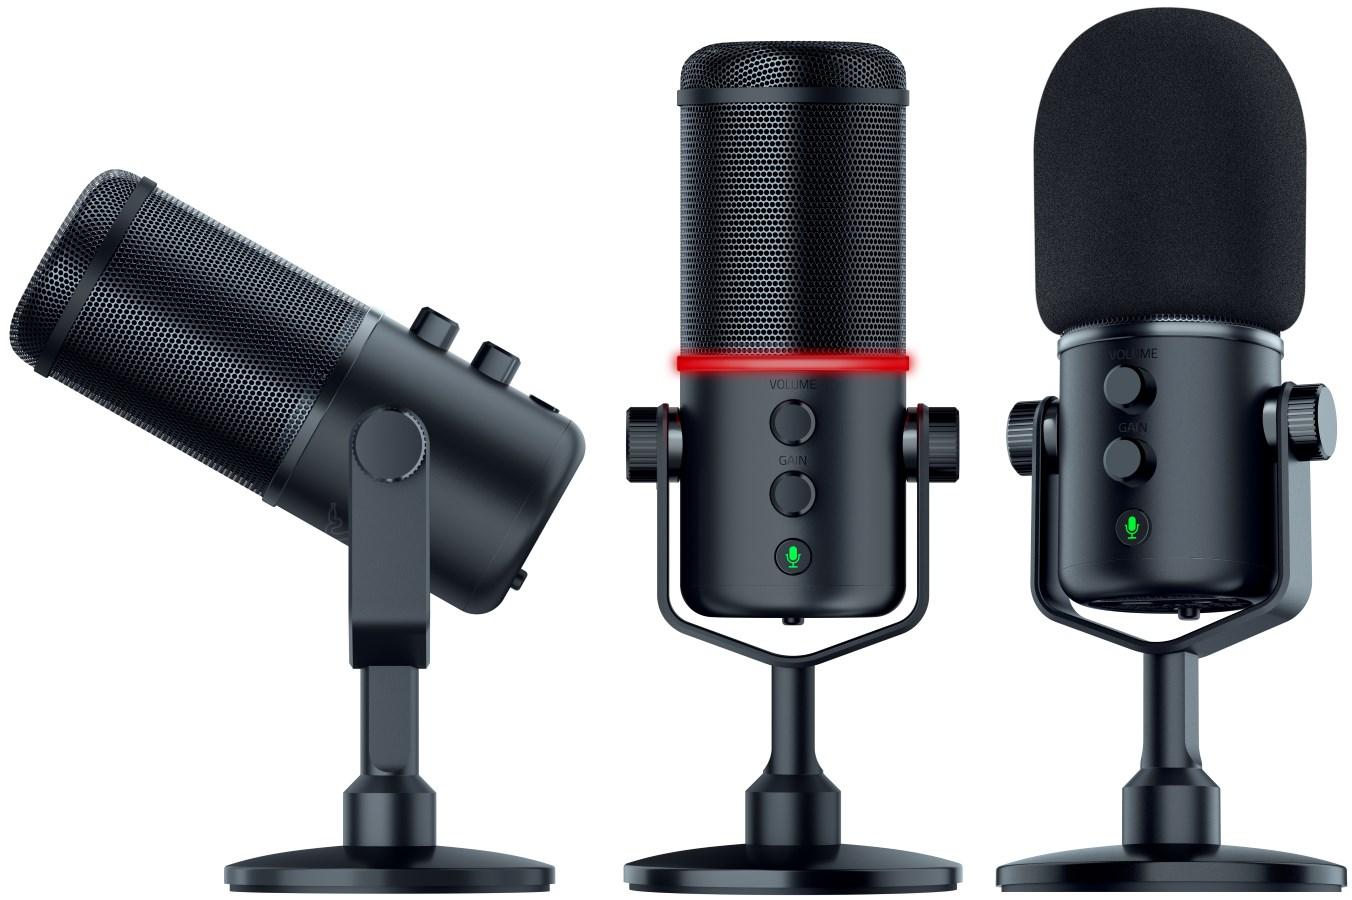 microfono razer mercadolibre